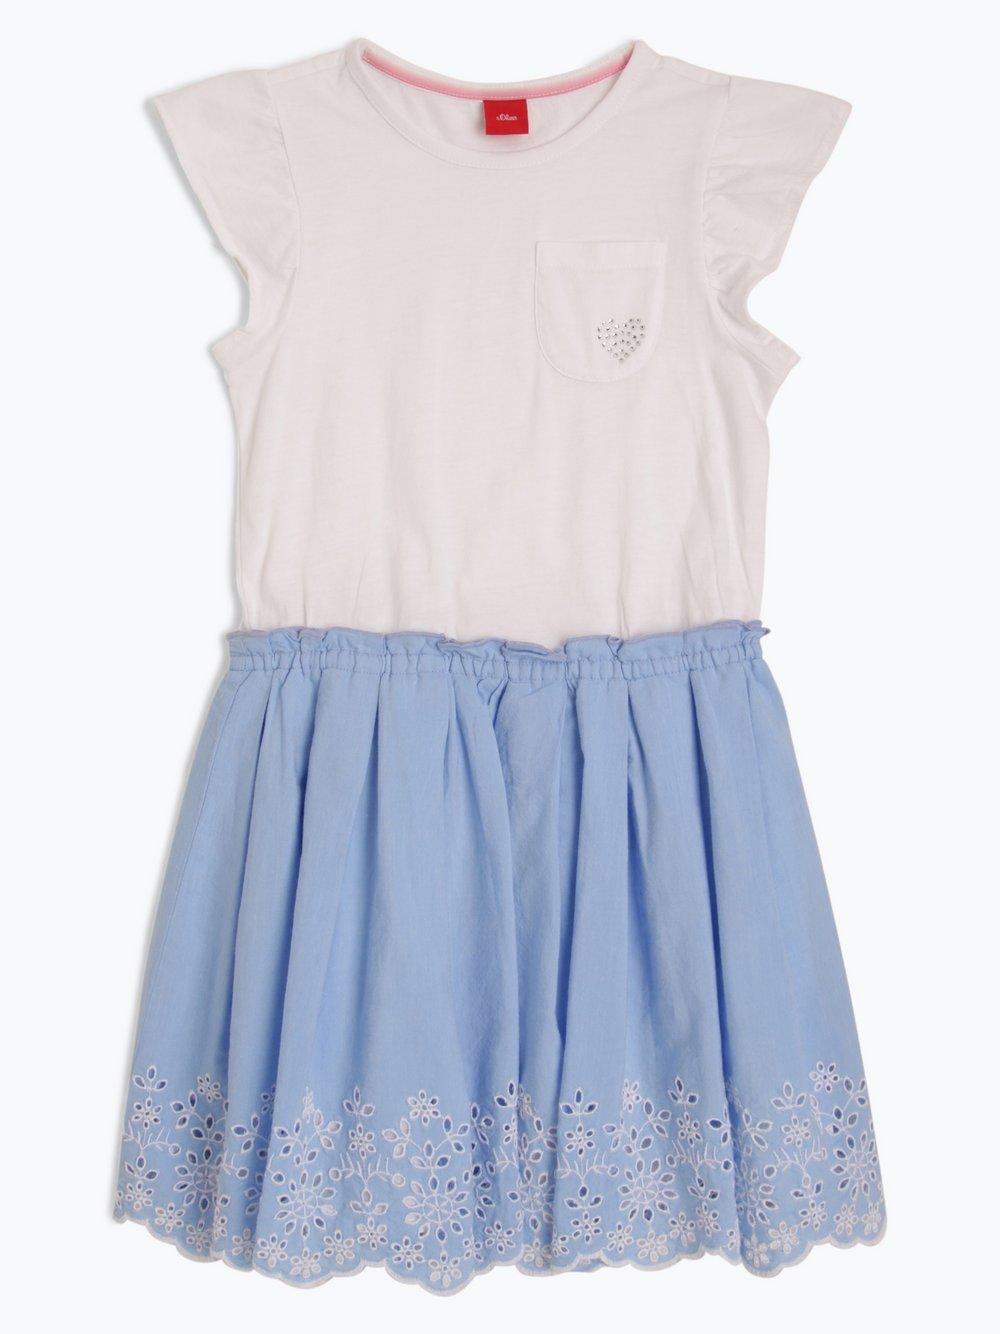 günstig 64f11 91ff2 s.Oliver Casual Mädchen Kleid online kaufen | VANGRAAF.COM